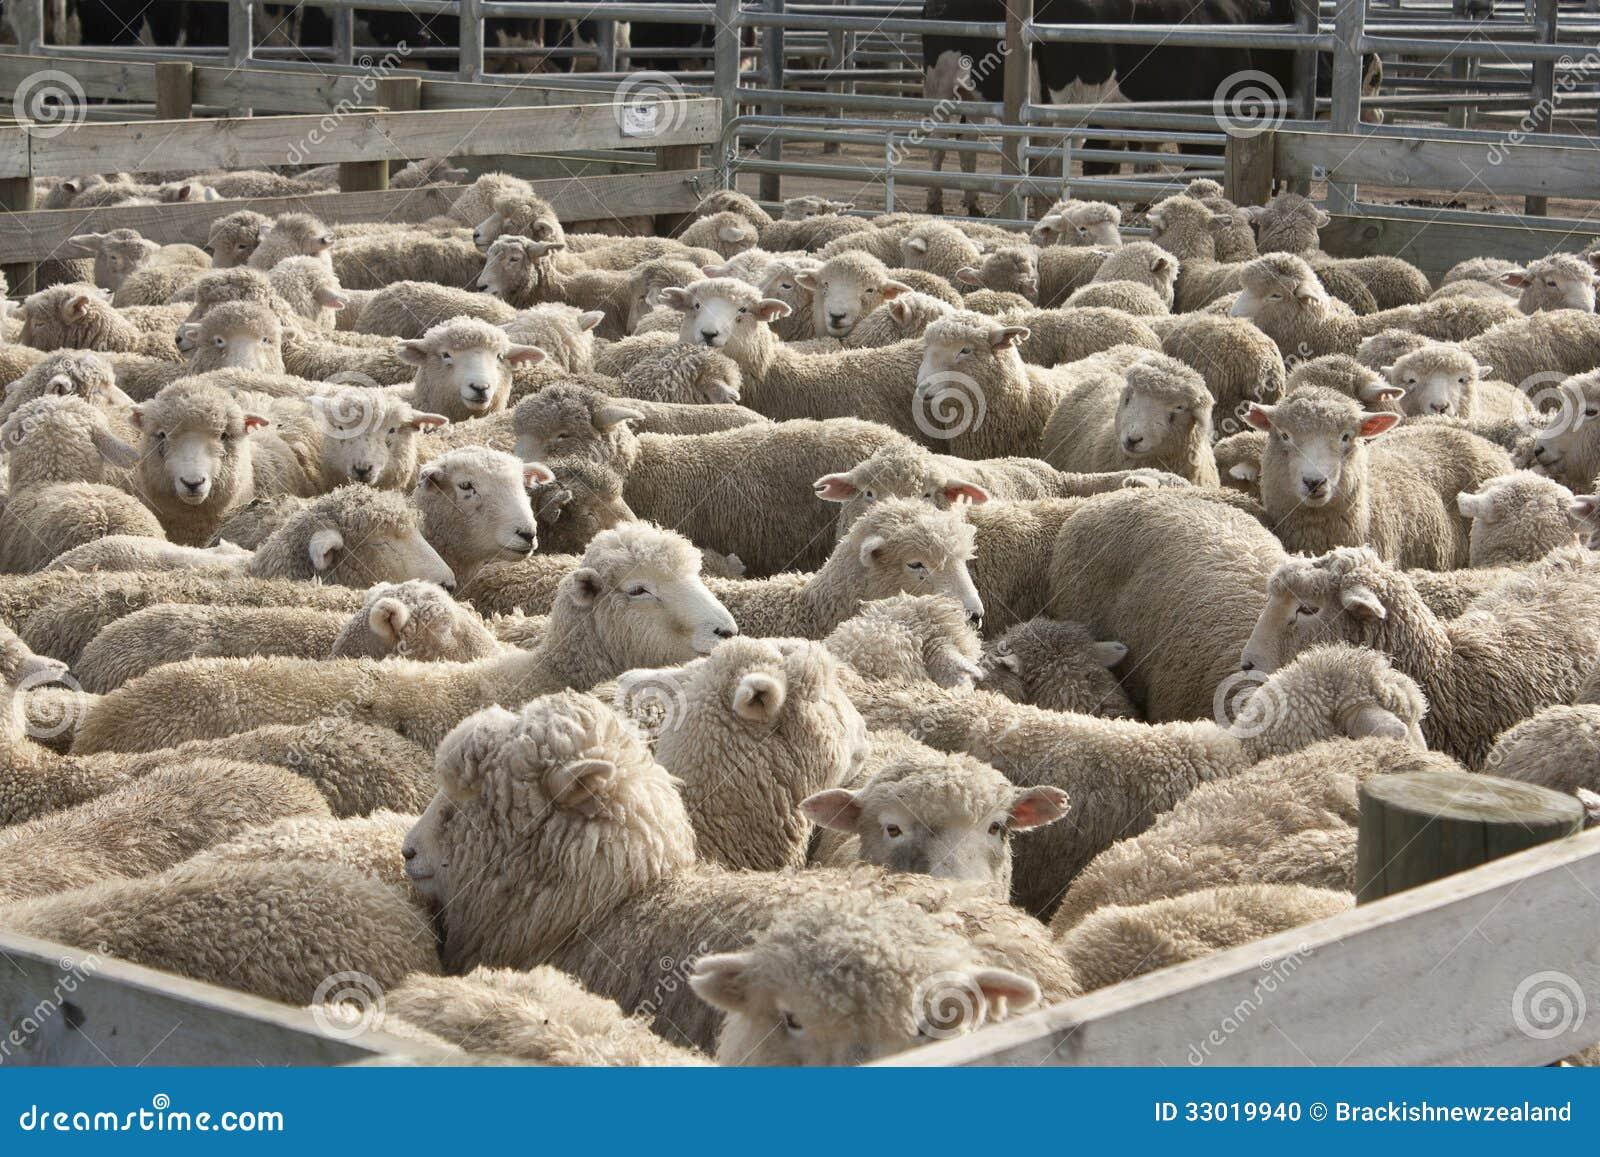 Sheep In Pen Stock Photo